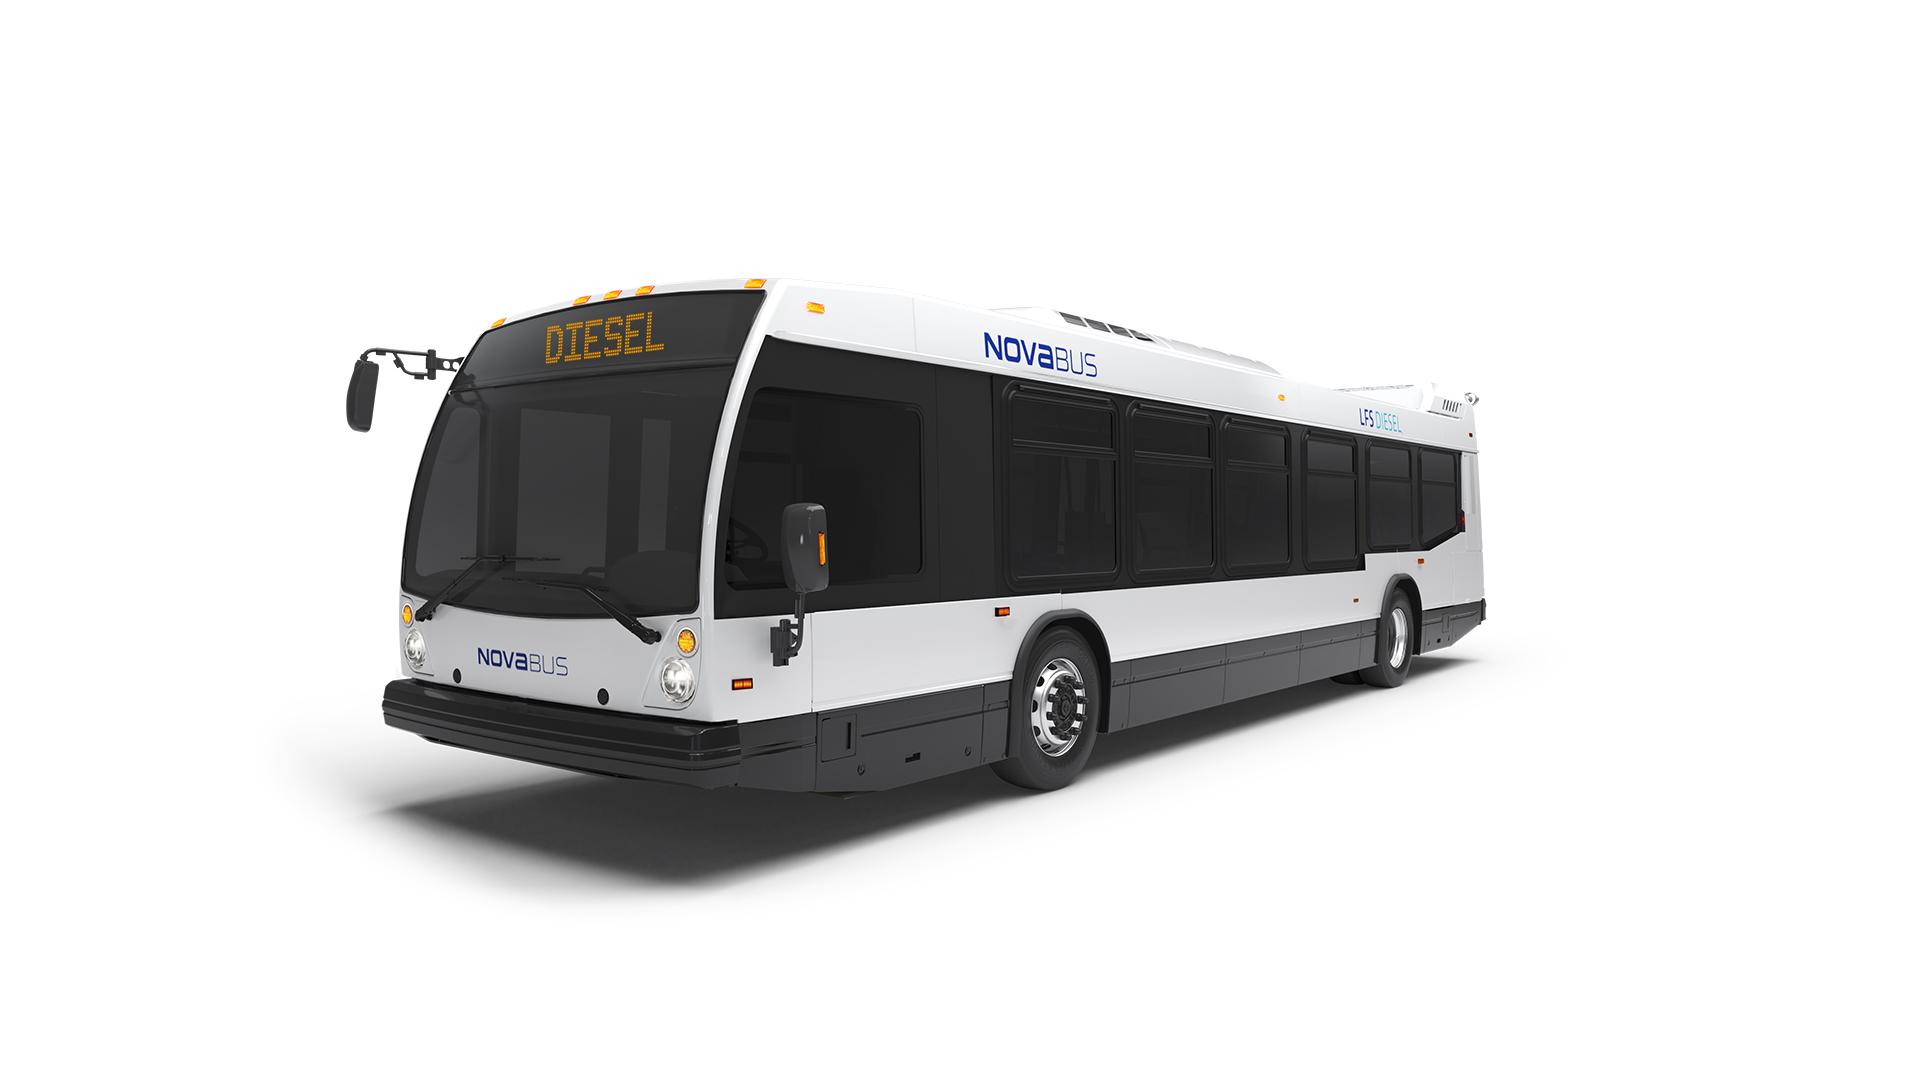 Nova LFS Diesel